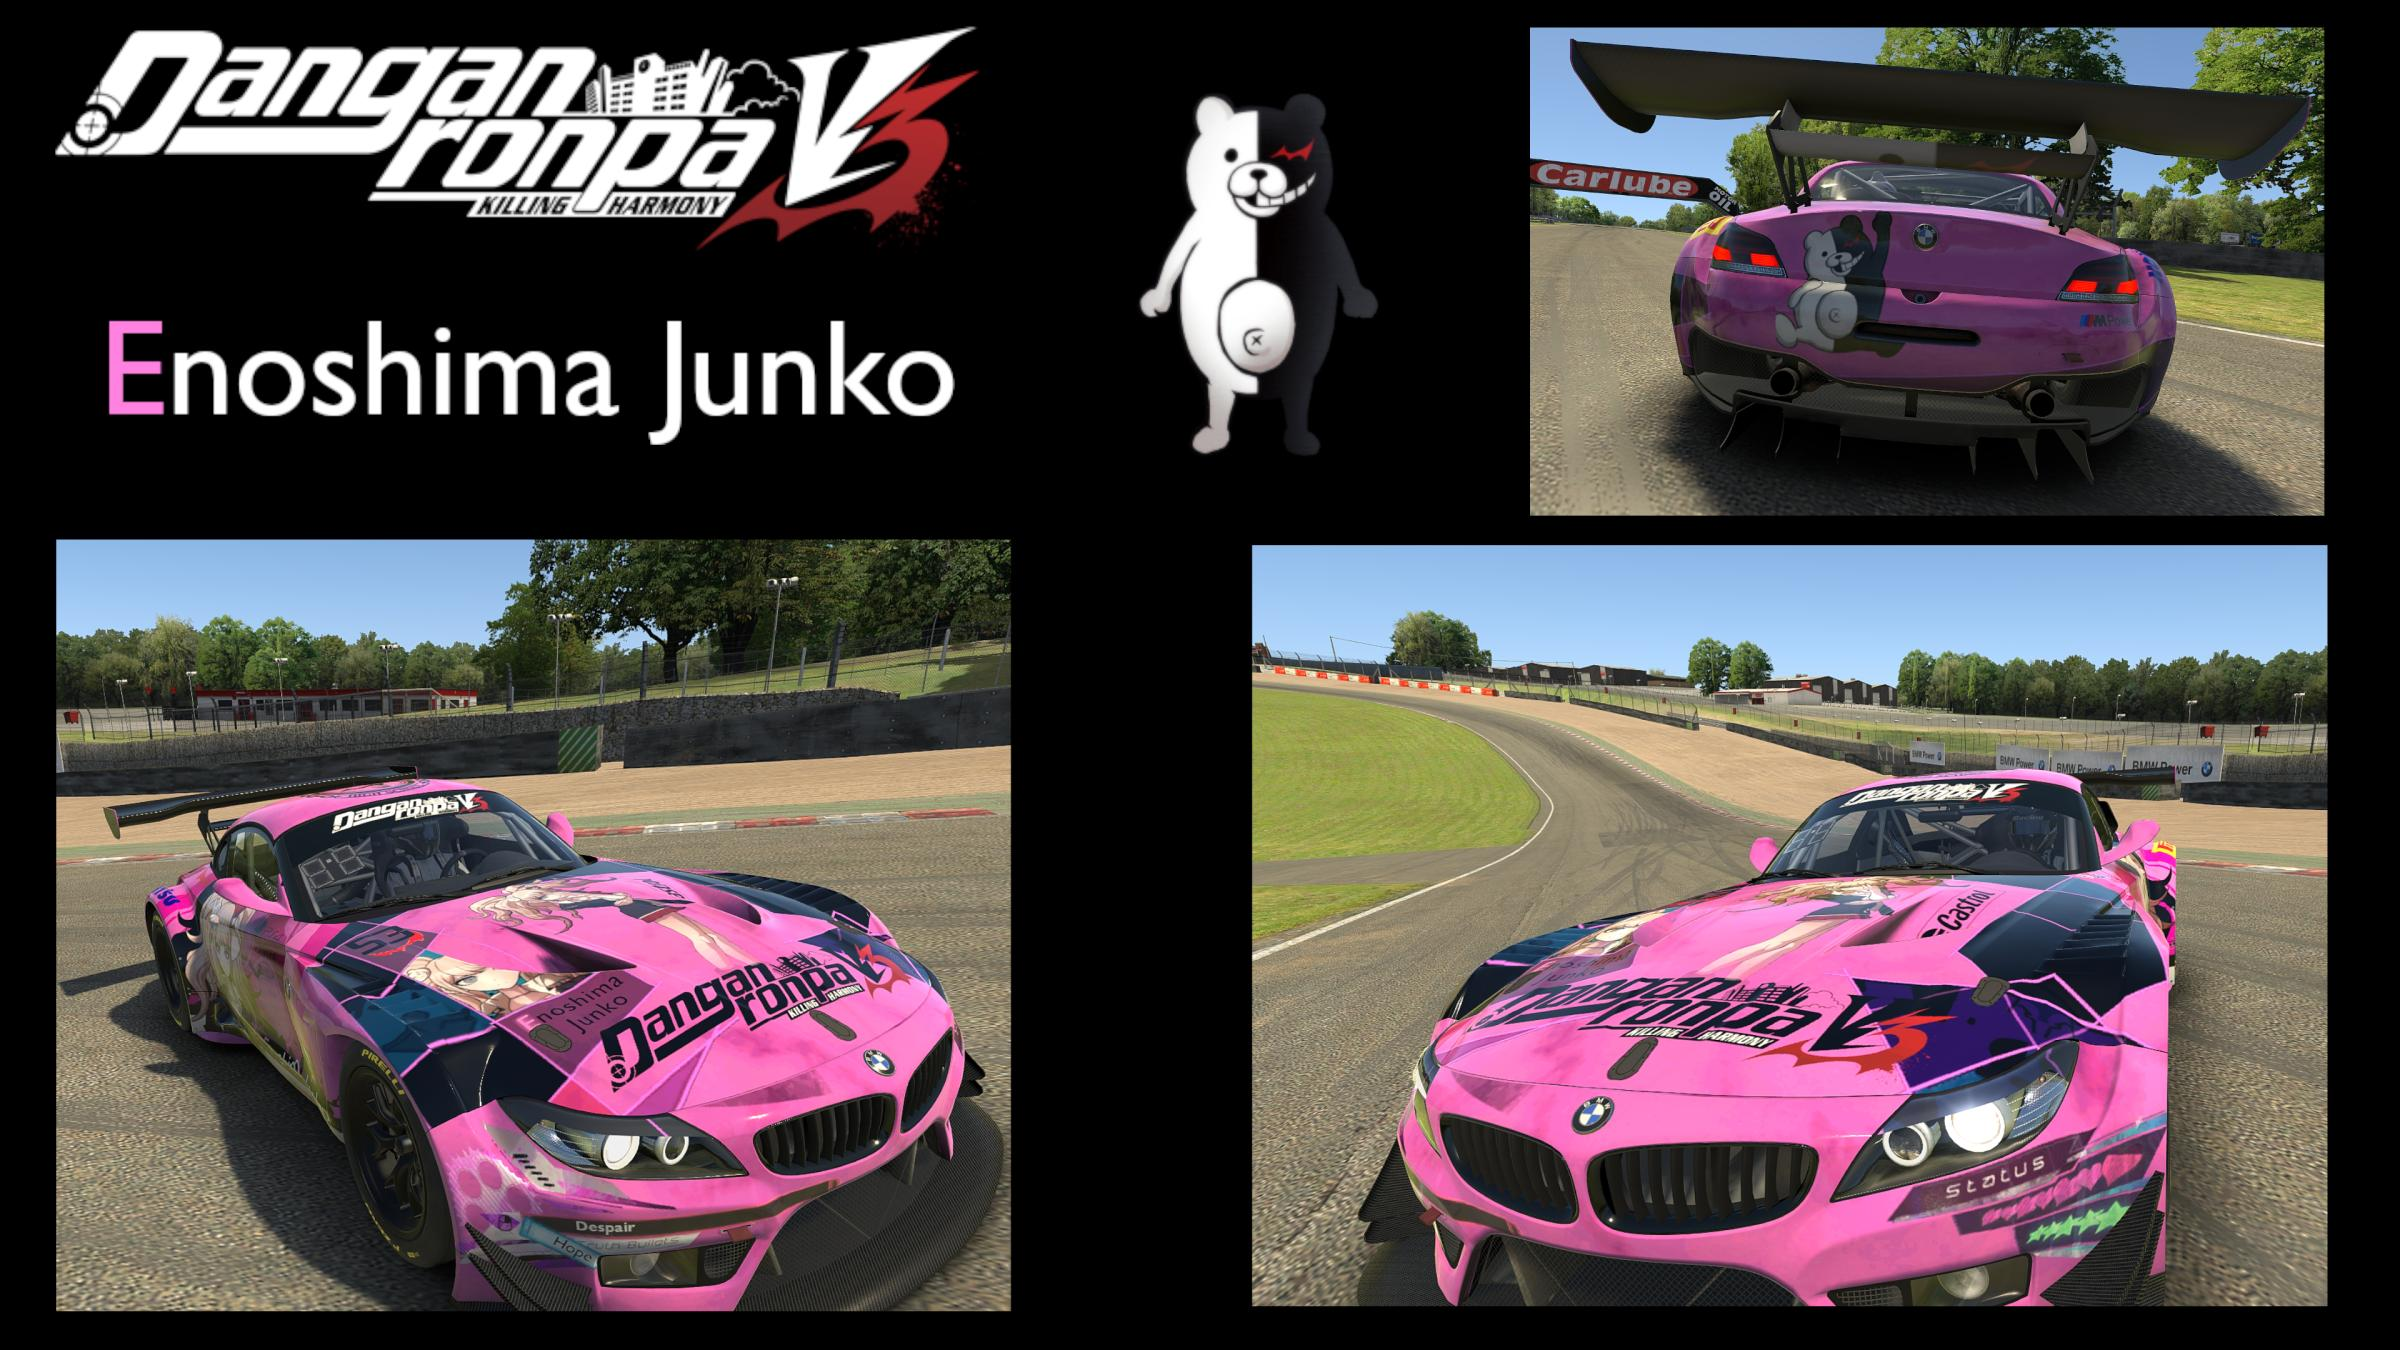 Preview of Enoshima Junko Danganronpa V3: Killing Harmony - BMW Z4 GT3 by Andrzej Frysiak